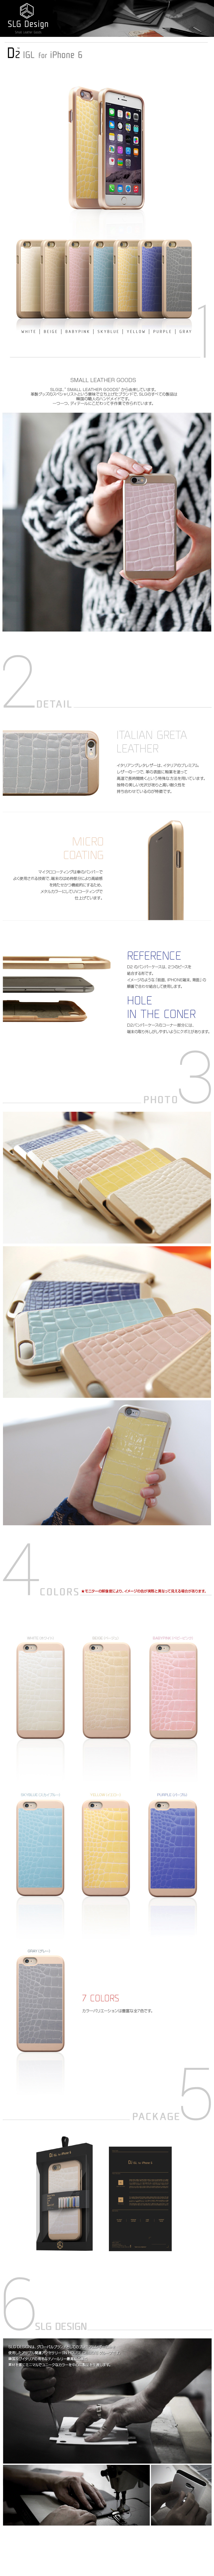 【iPhone6 ケース】SLG Design D2 Italian Greta Leather Bar